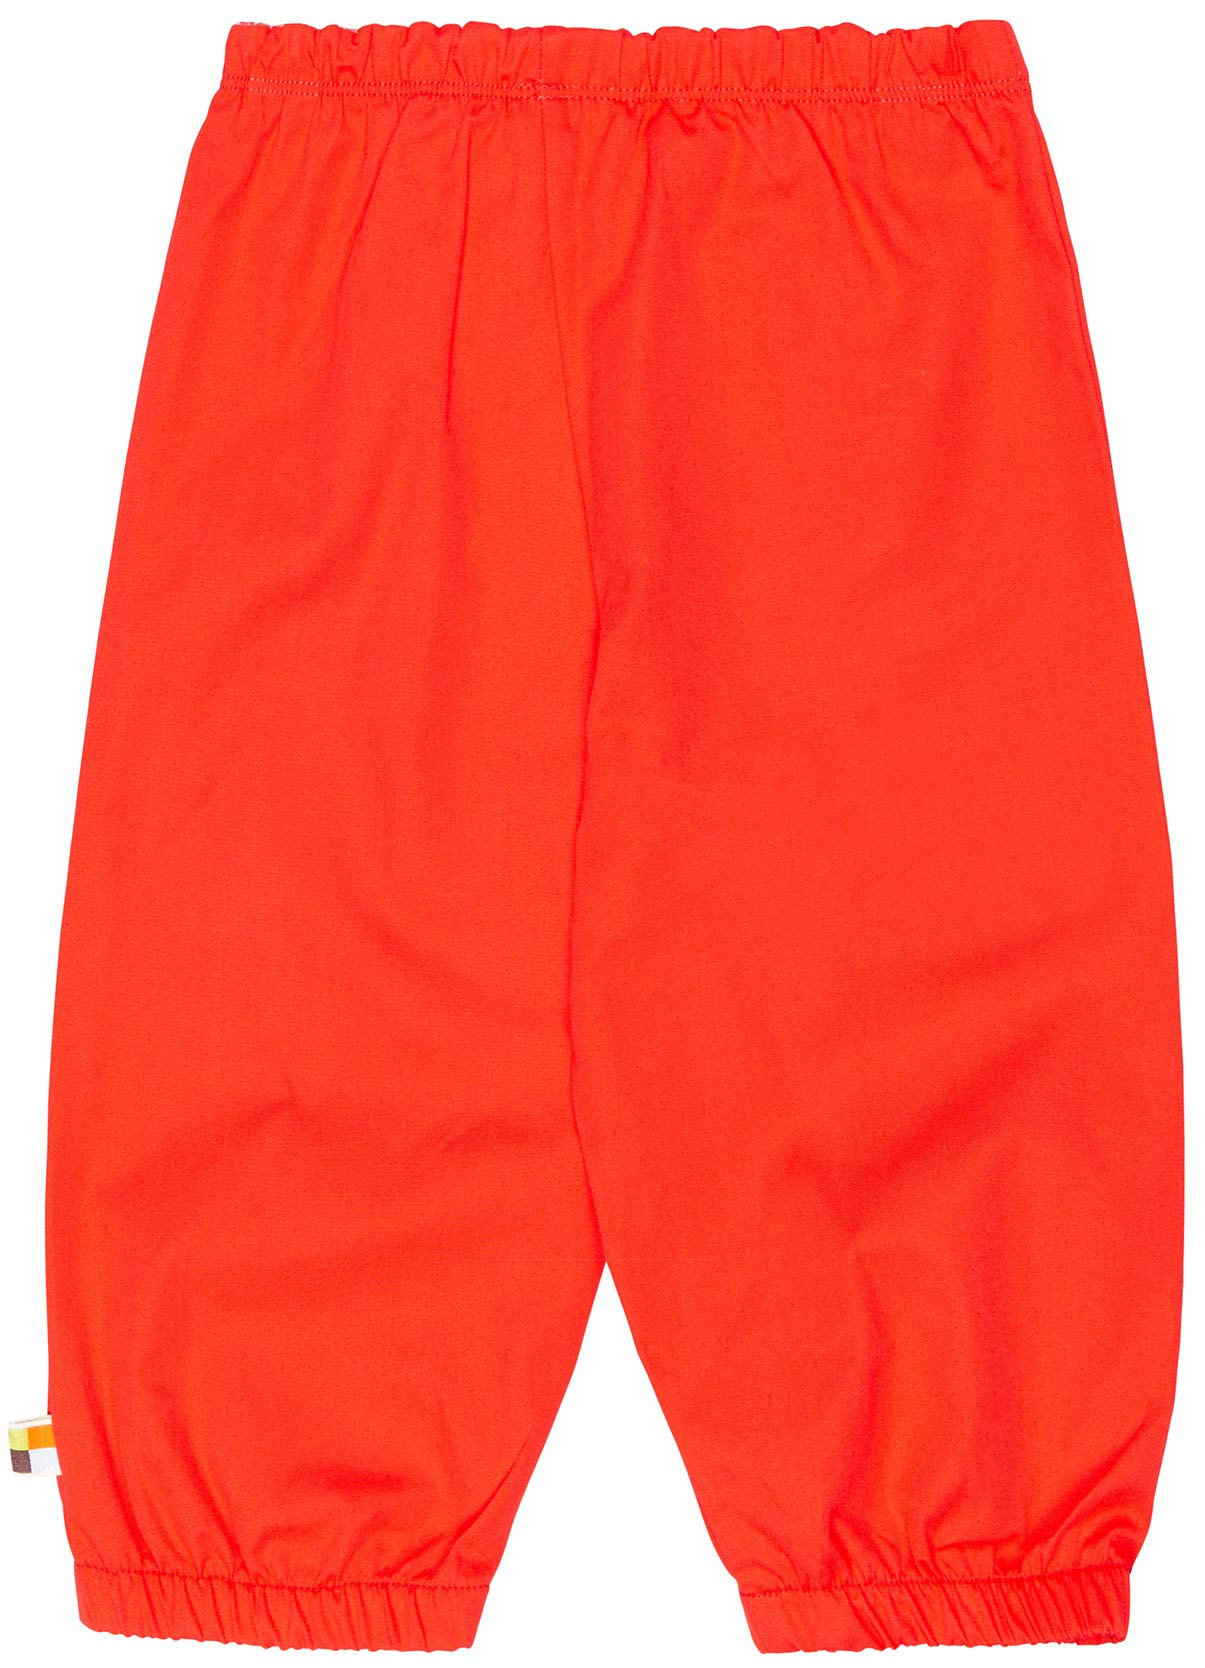 loud + proud Wasserabweisende Outdoorhose, Aus Bio Baumwolle, Gots Zertiziziert Pantalones para Bebés 2